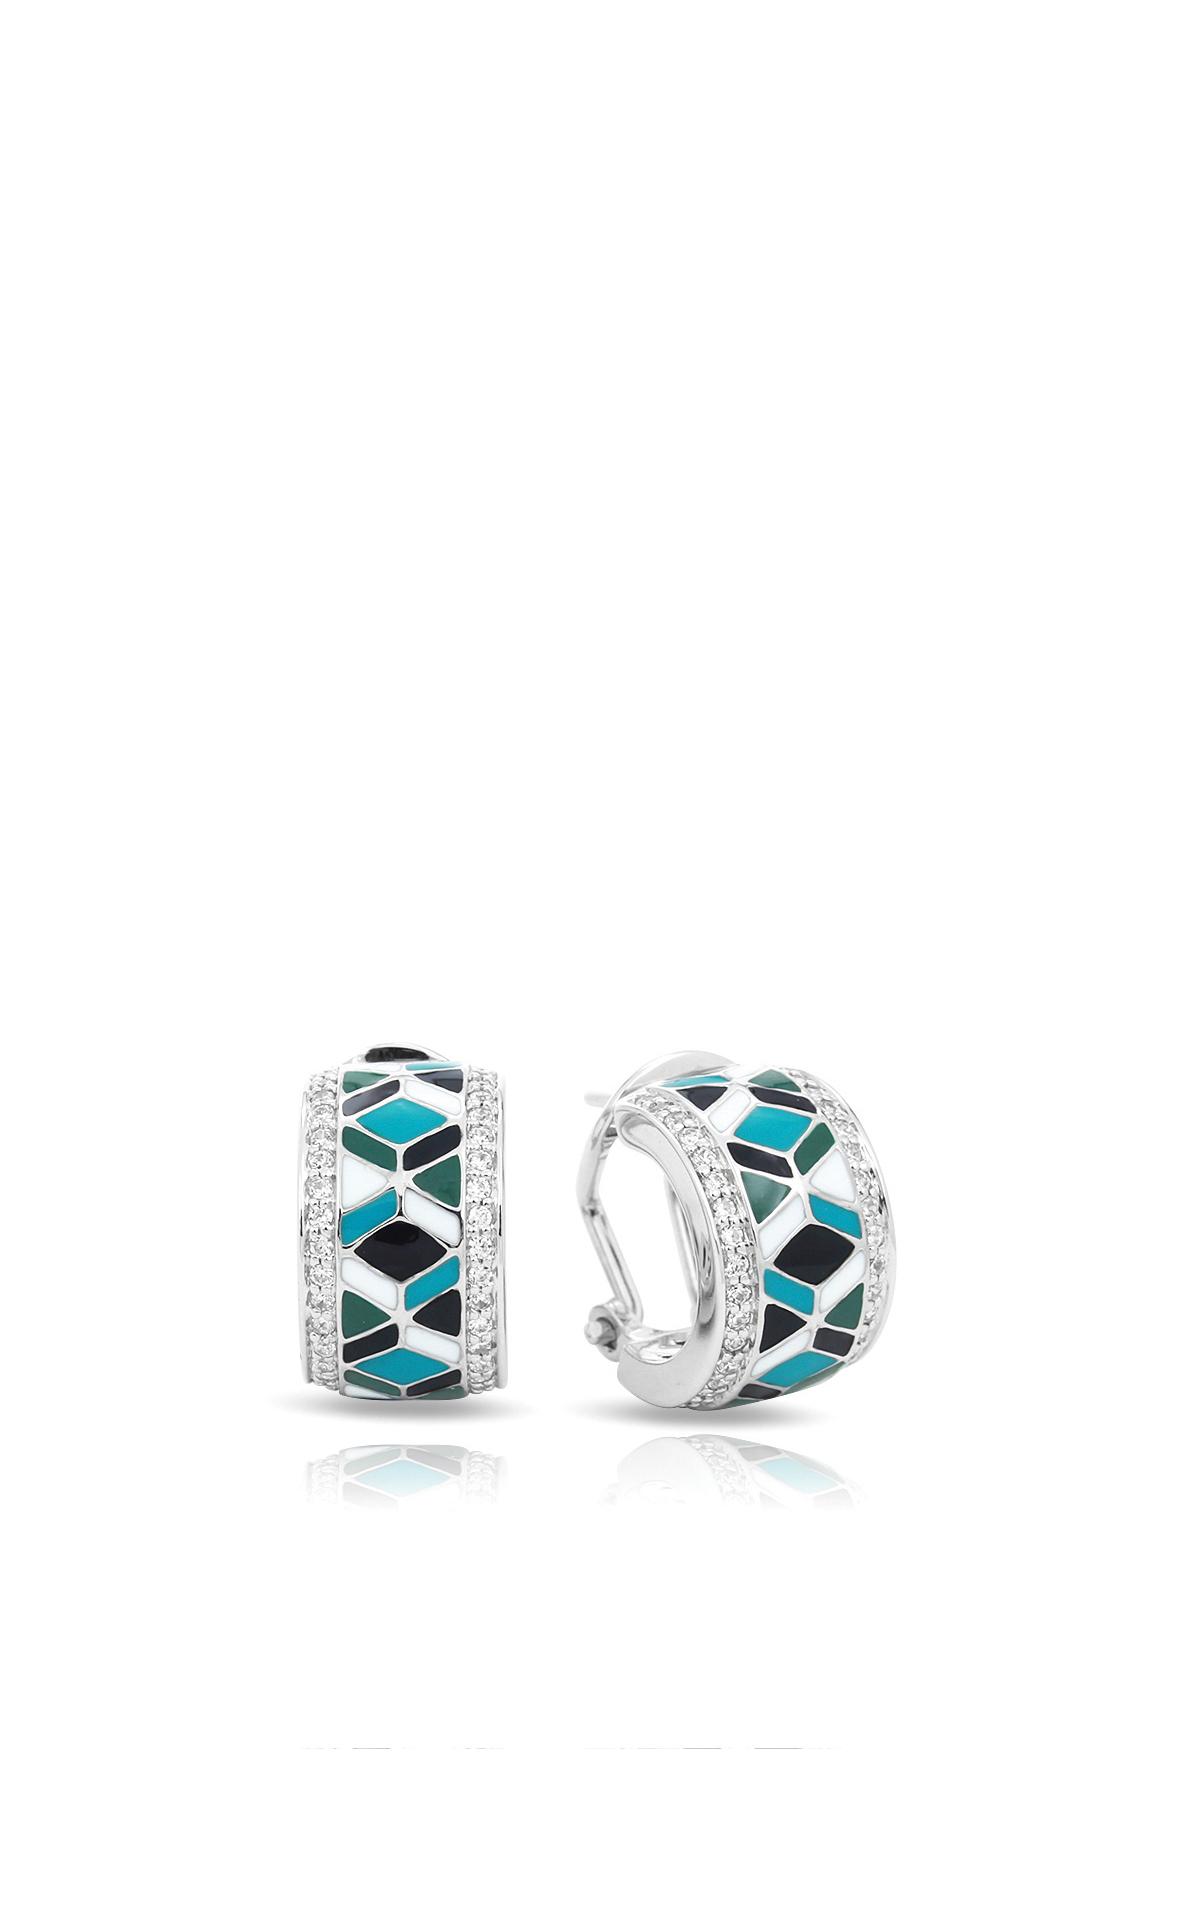 Belle Etoile Forma Blue Earrings 3021520502 product image